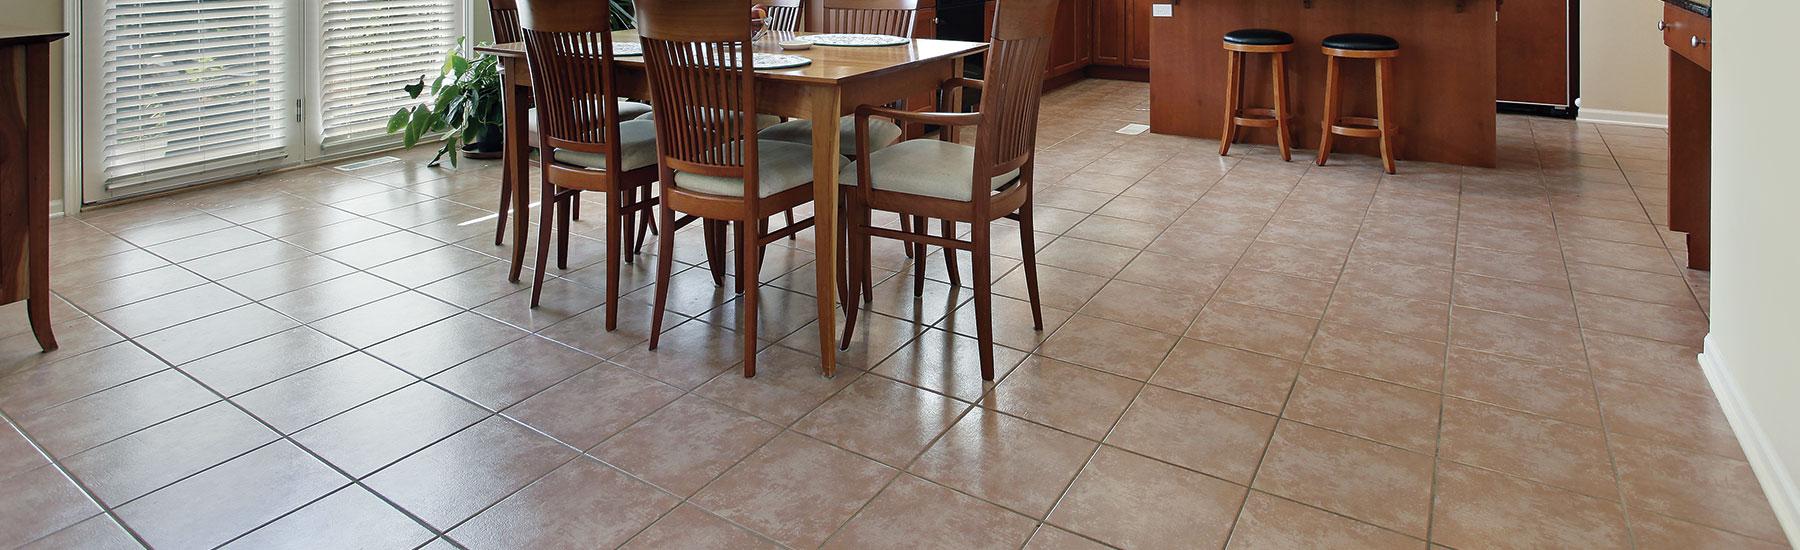 Mireaults Home Furnishing Tile Shop Appliancesmattress